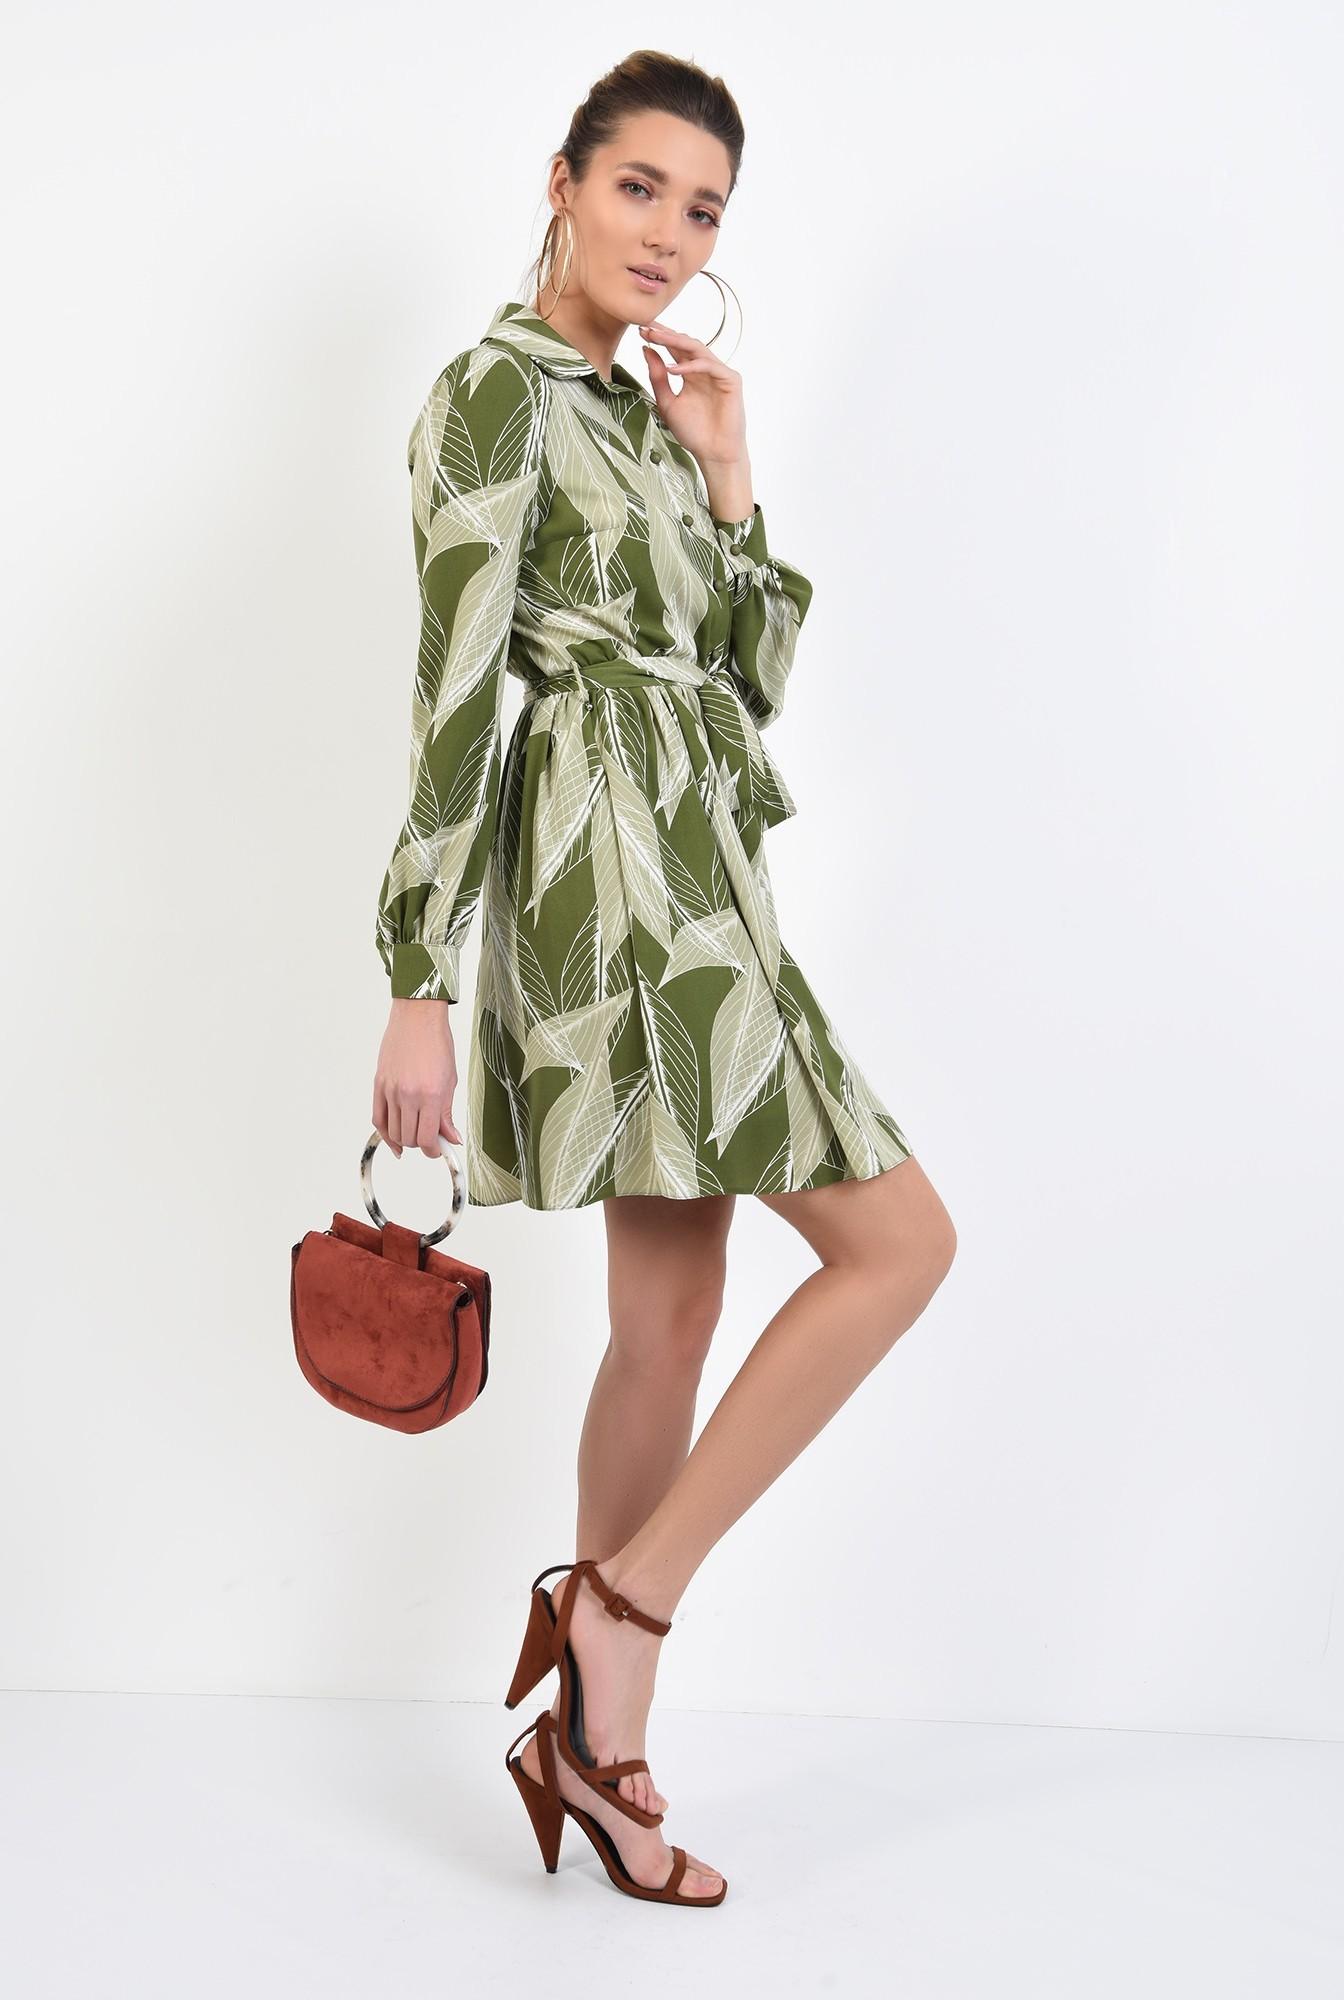 360 - rochie mini, cu print botanic, maneci lungi, nasturi, cordon